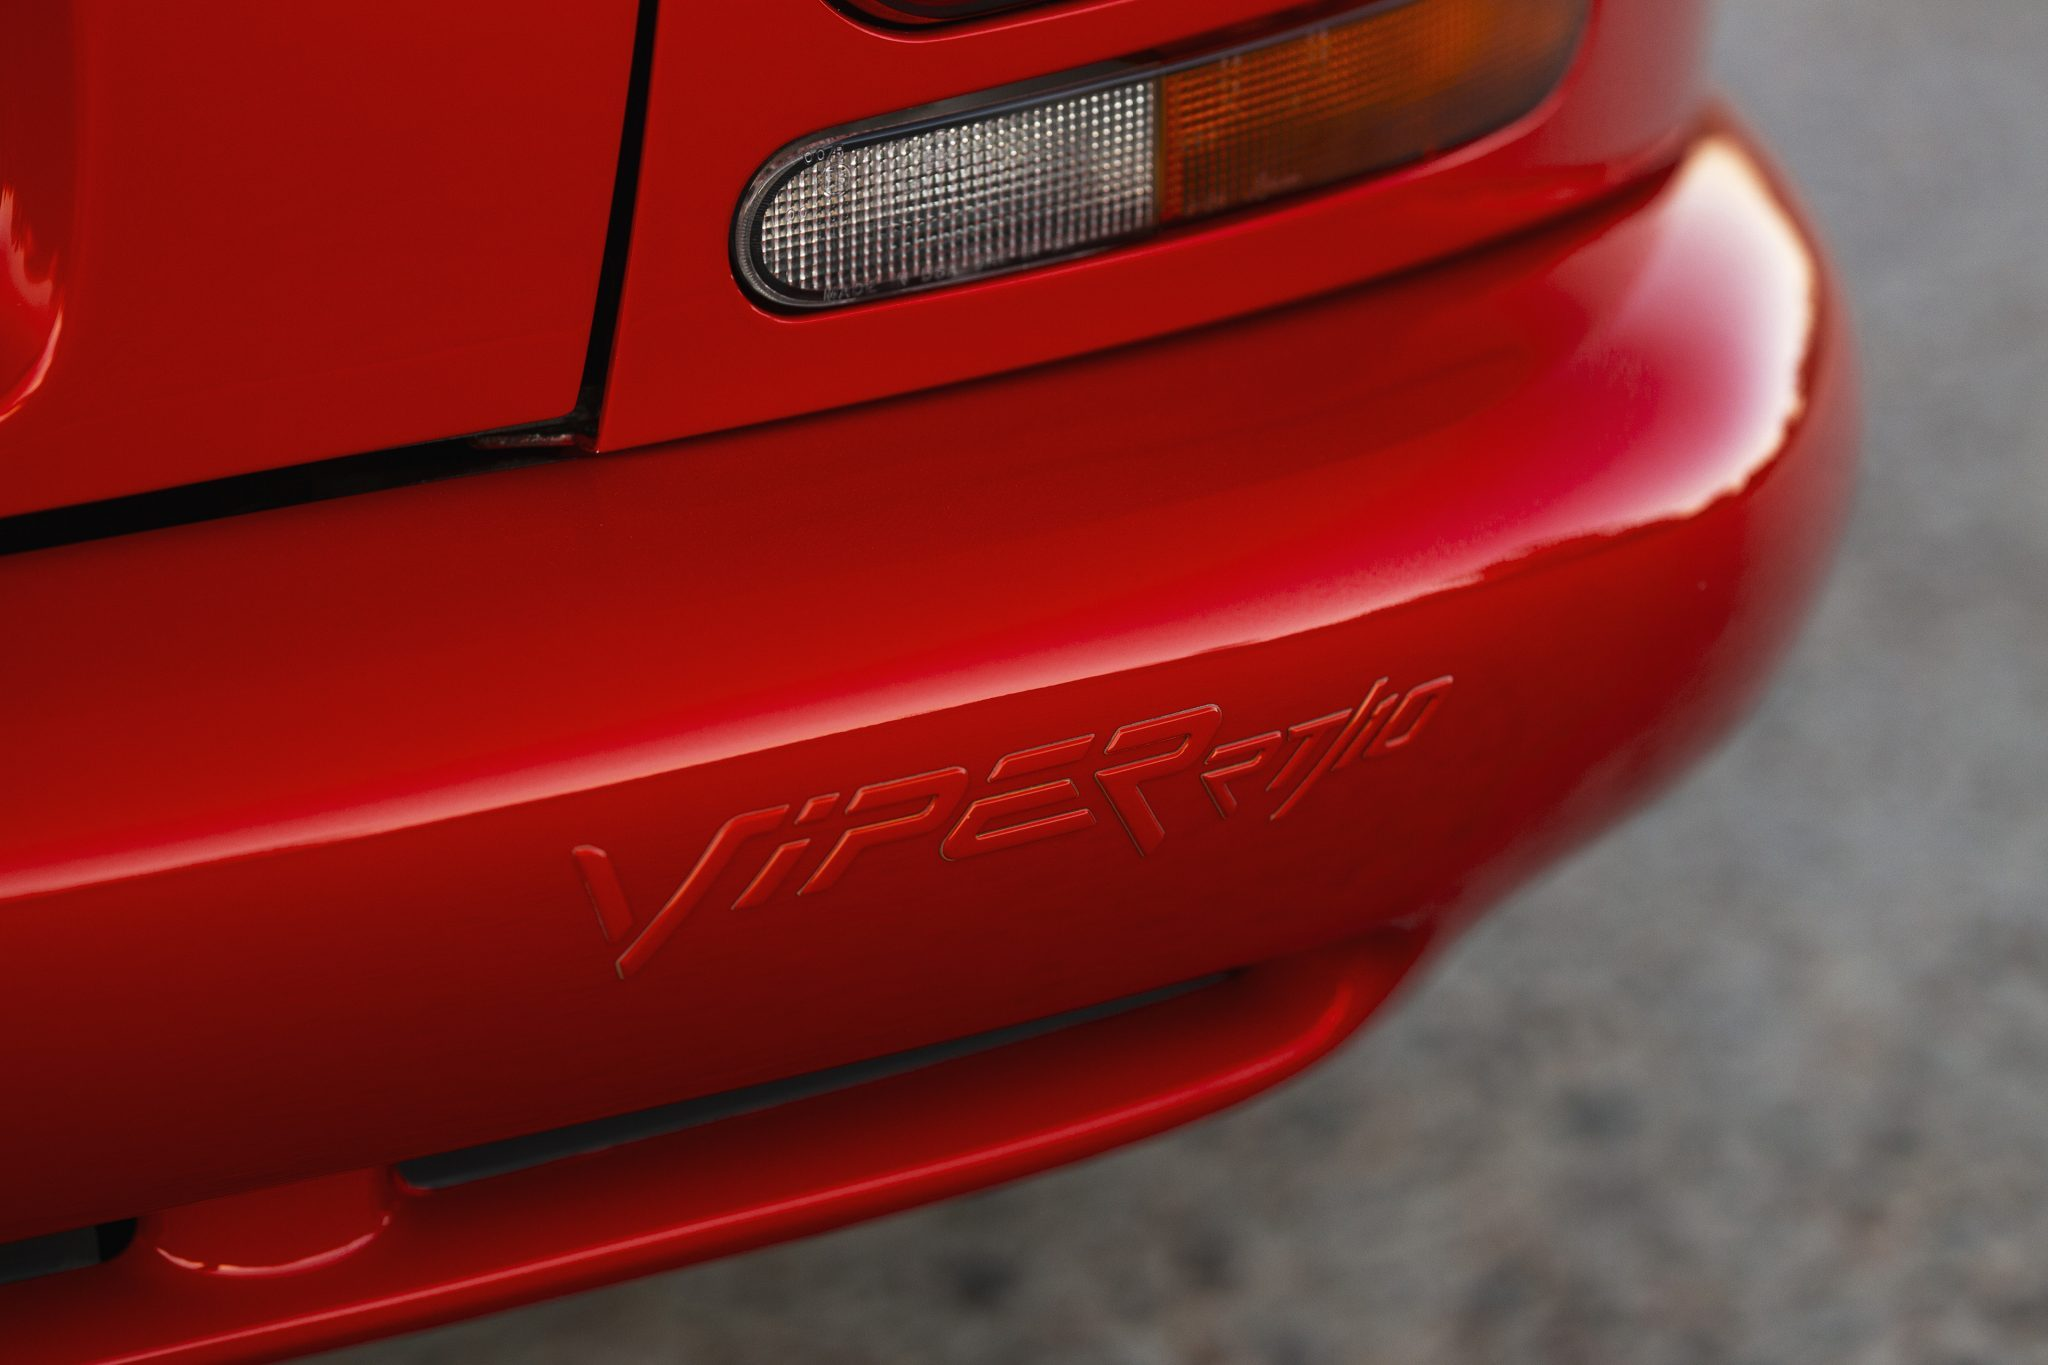 1992 Dodge Viper RT-10 rear bumper lettering